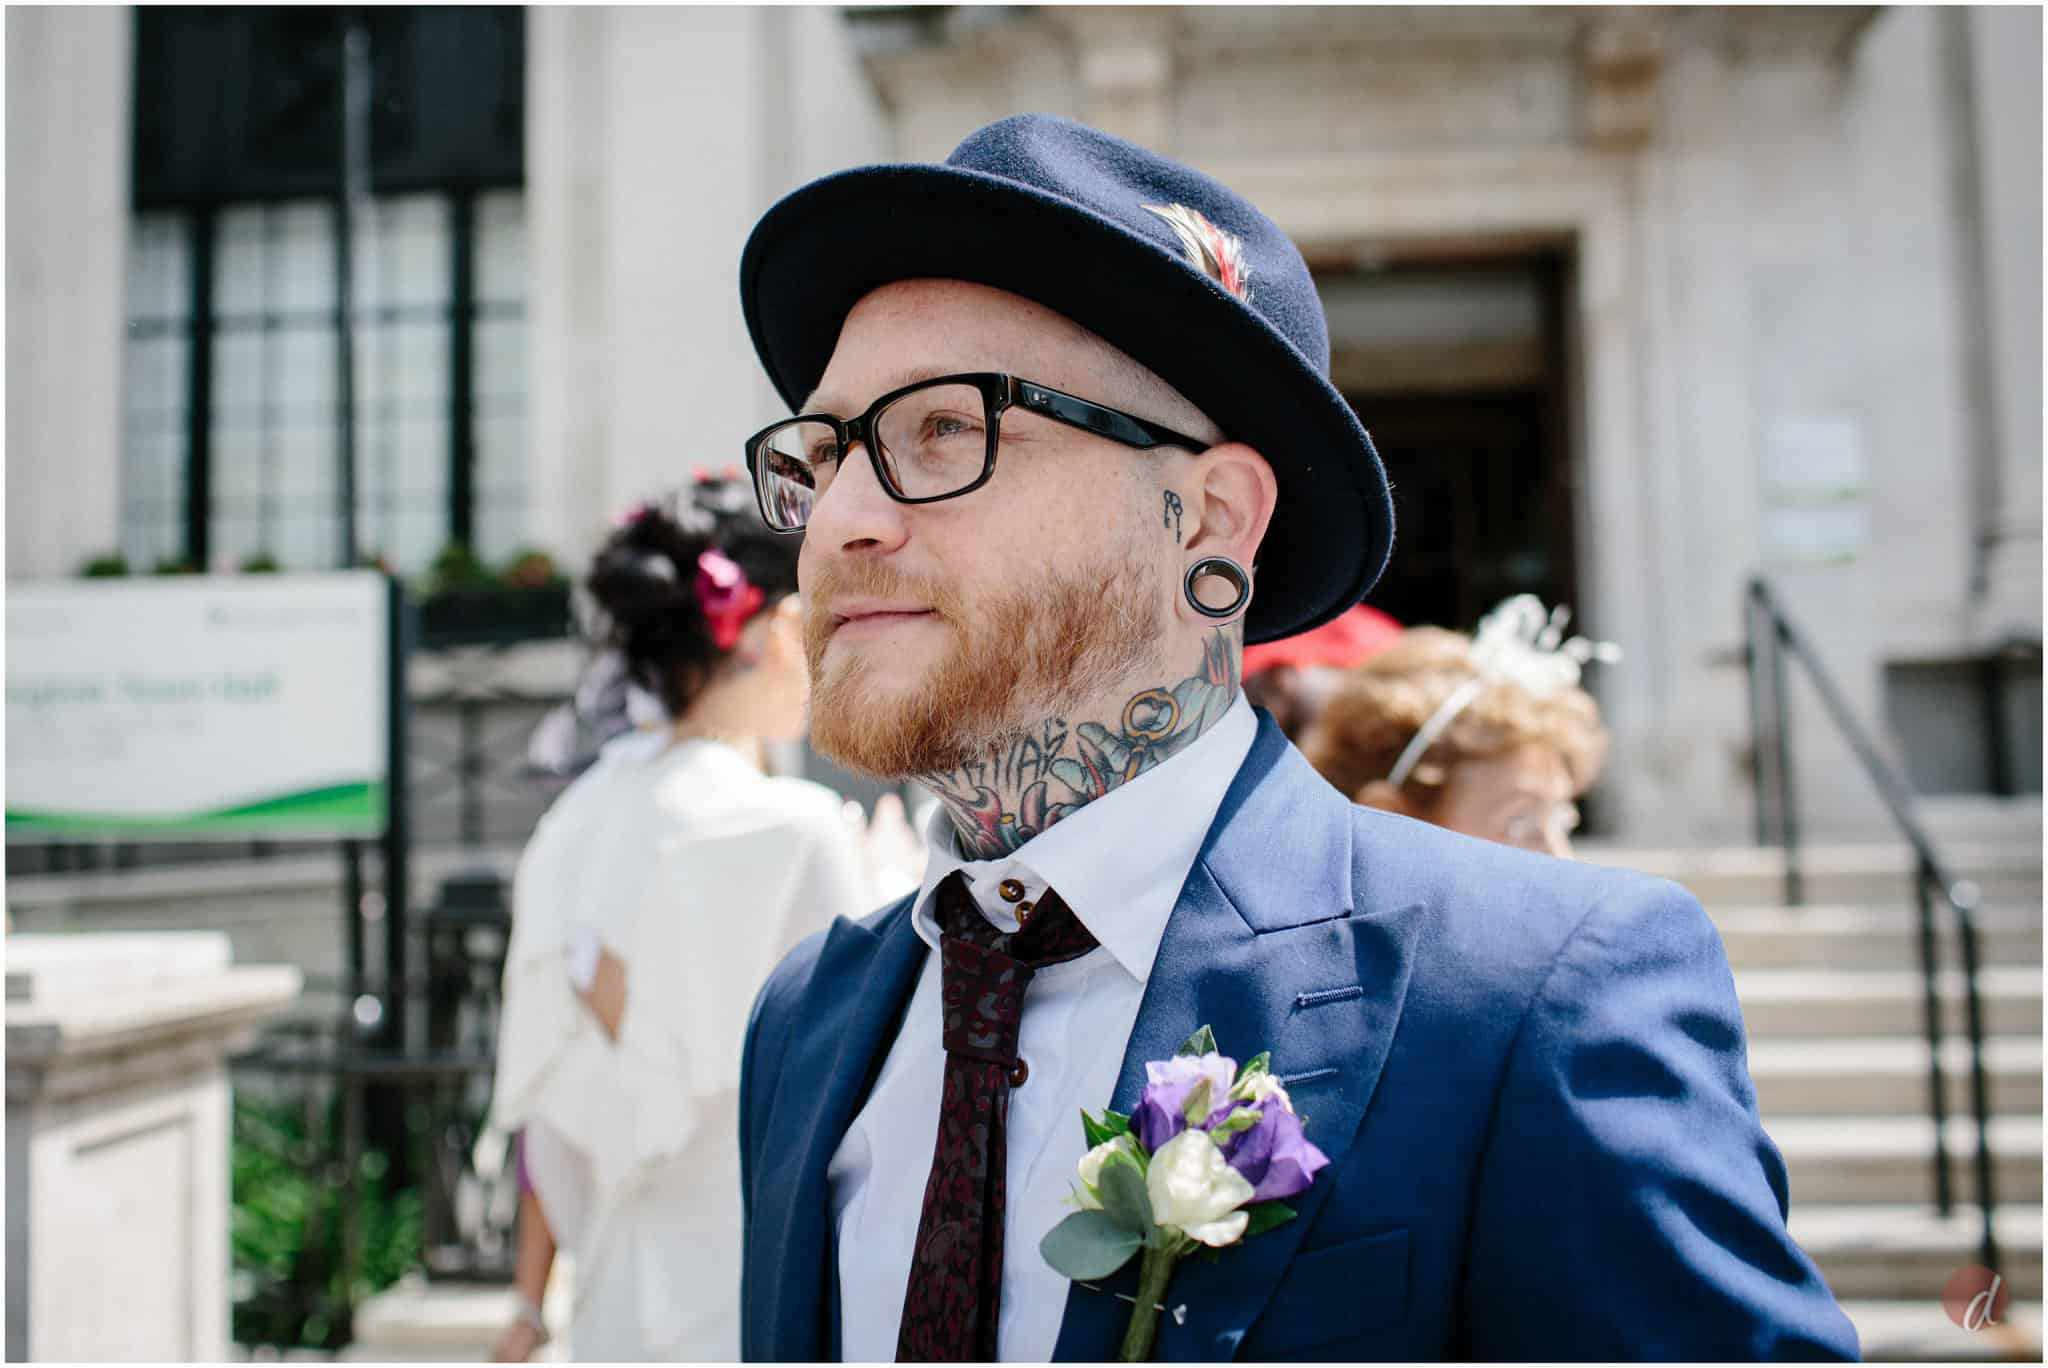 tattood groom at wedding